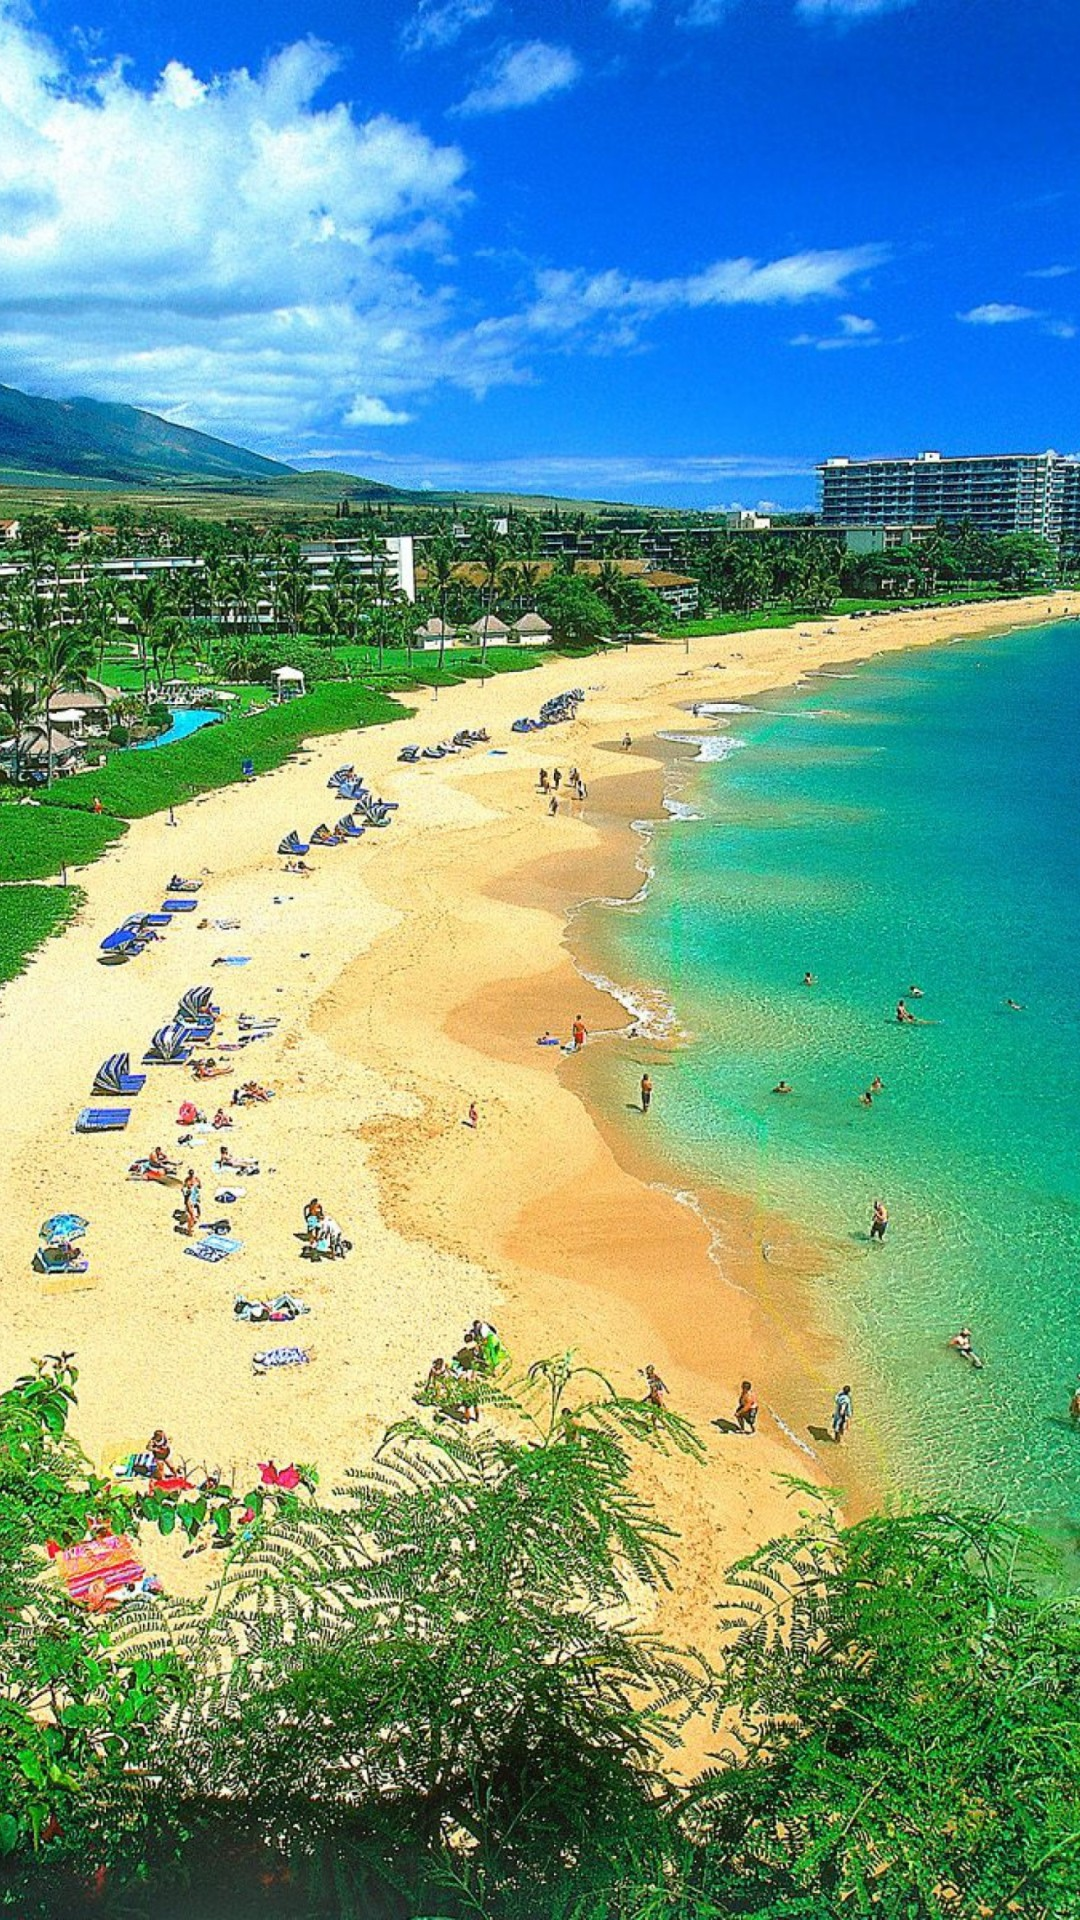 Hawaiian Tiki Wallpaper 35 images 1080x1920